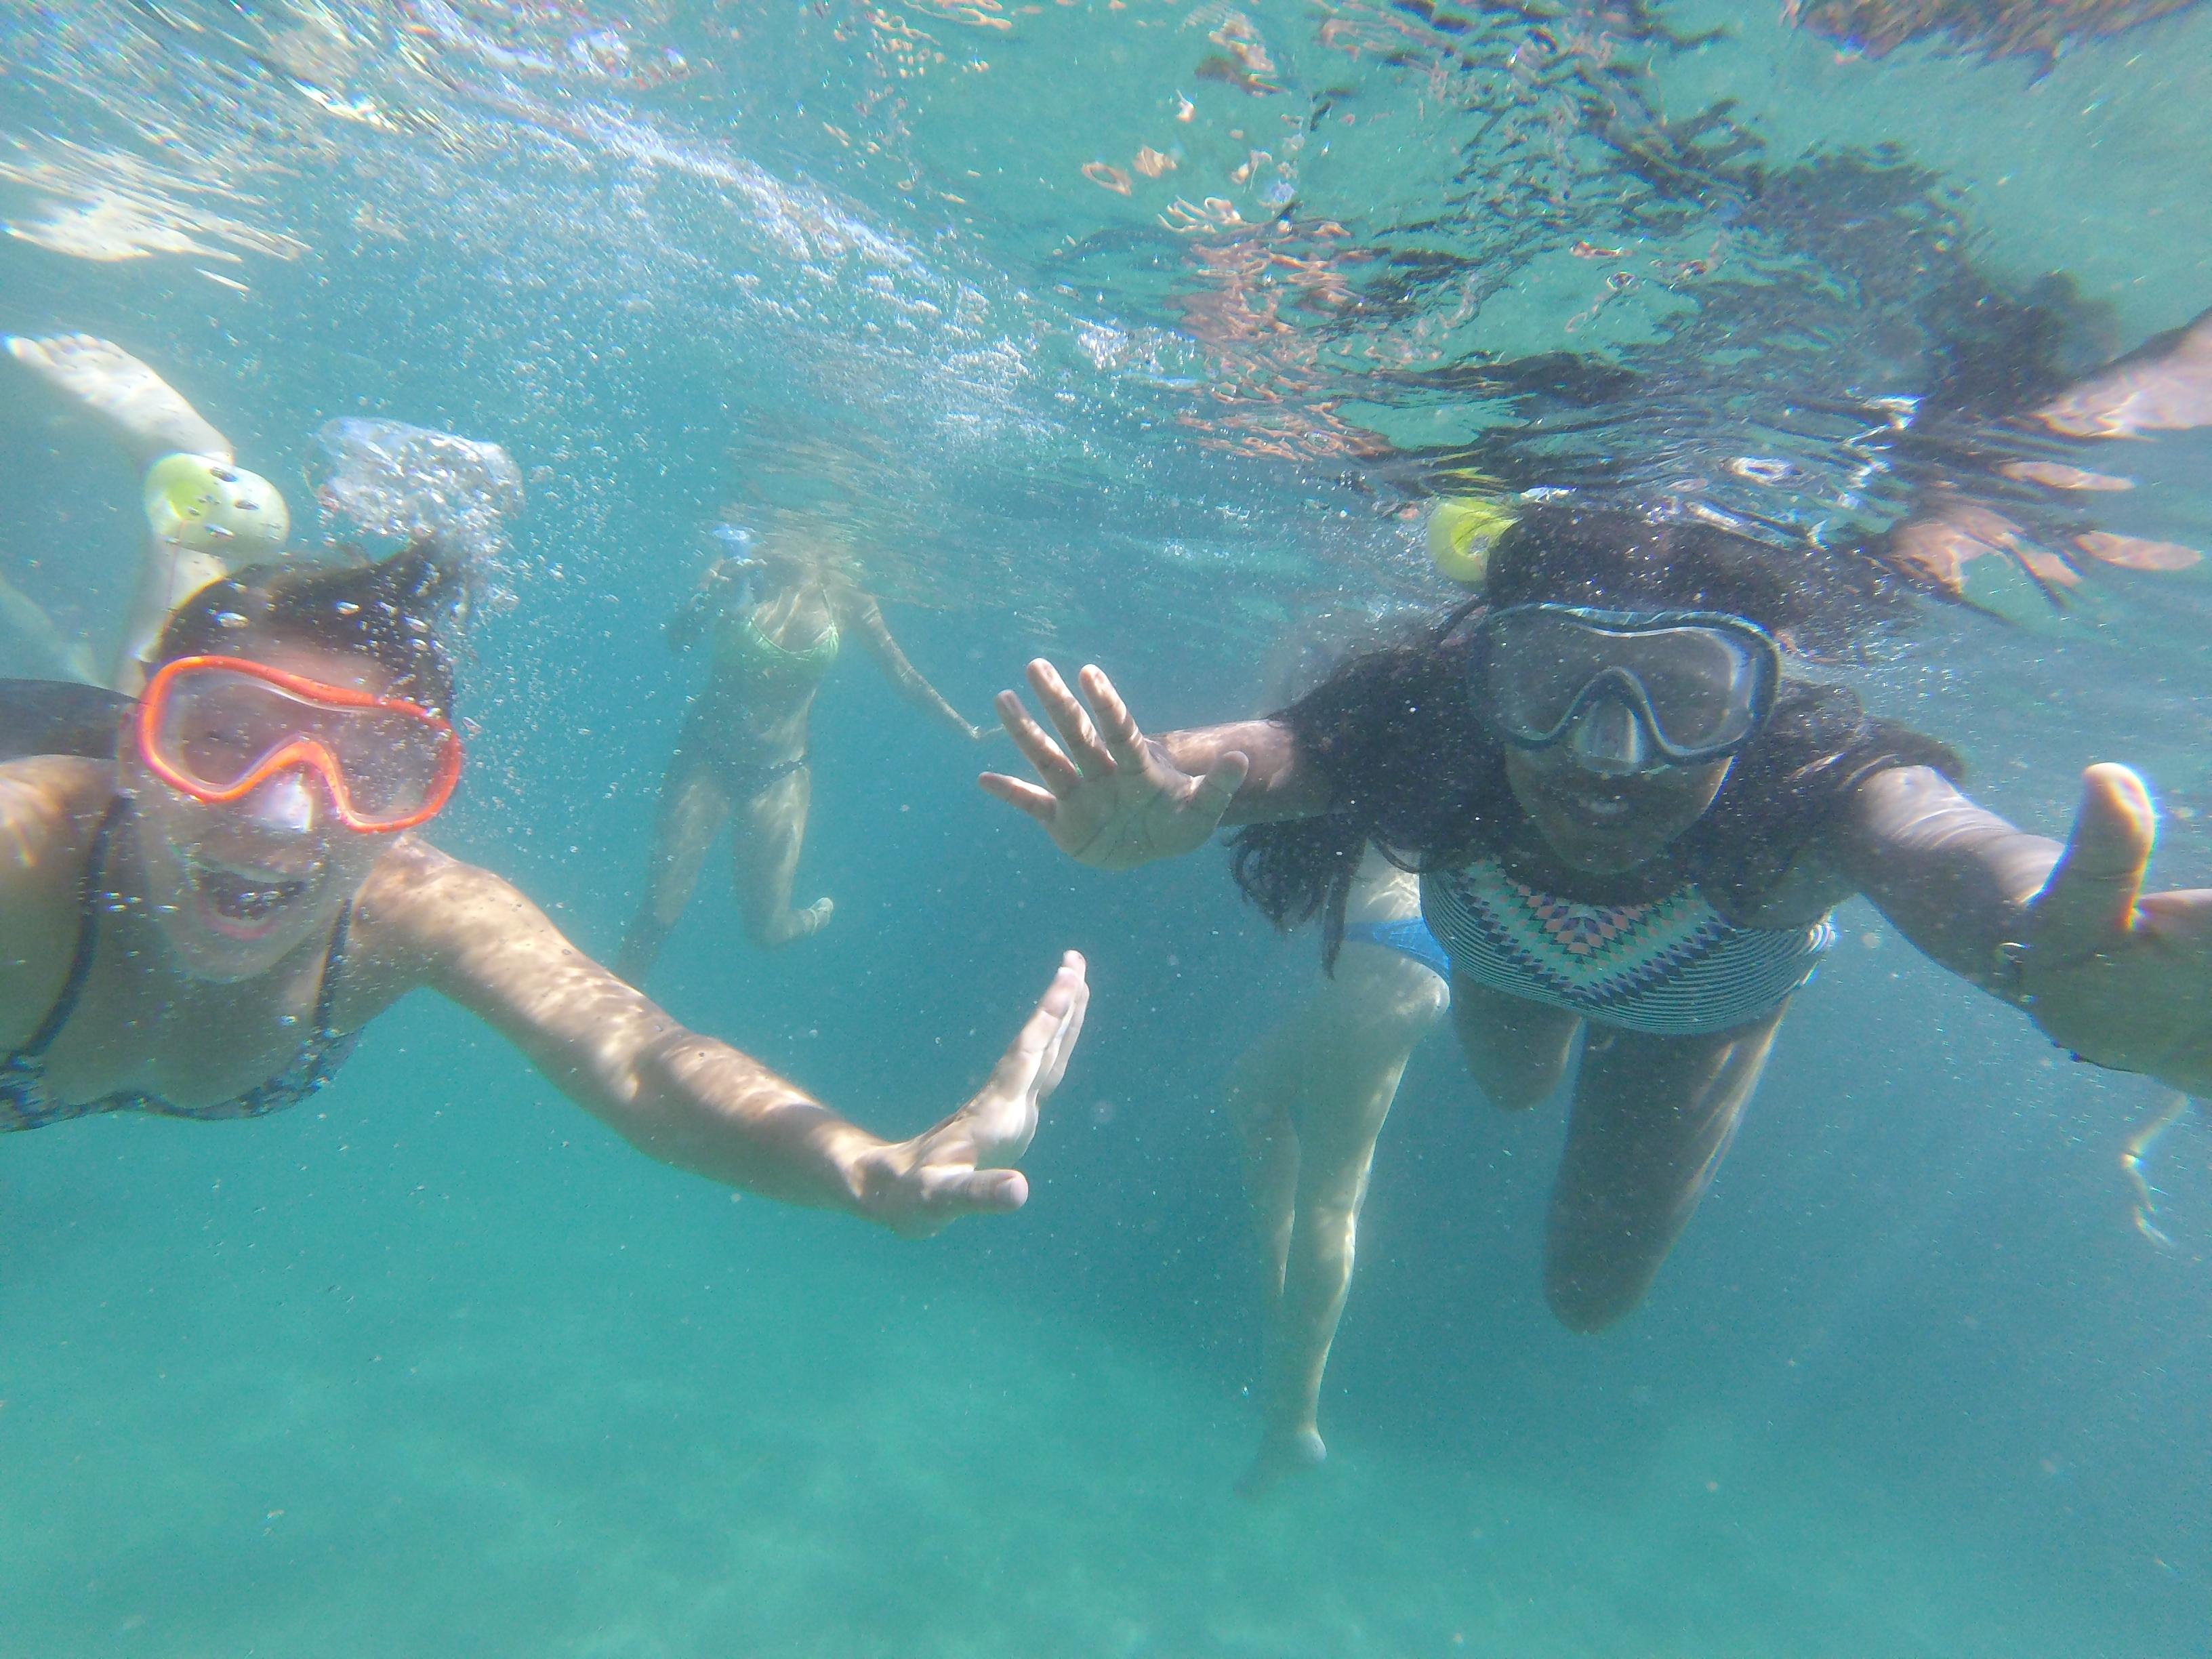 Summer Program - Promoting Volunteerism | Global Works - Spain: Service & Sights